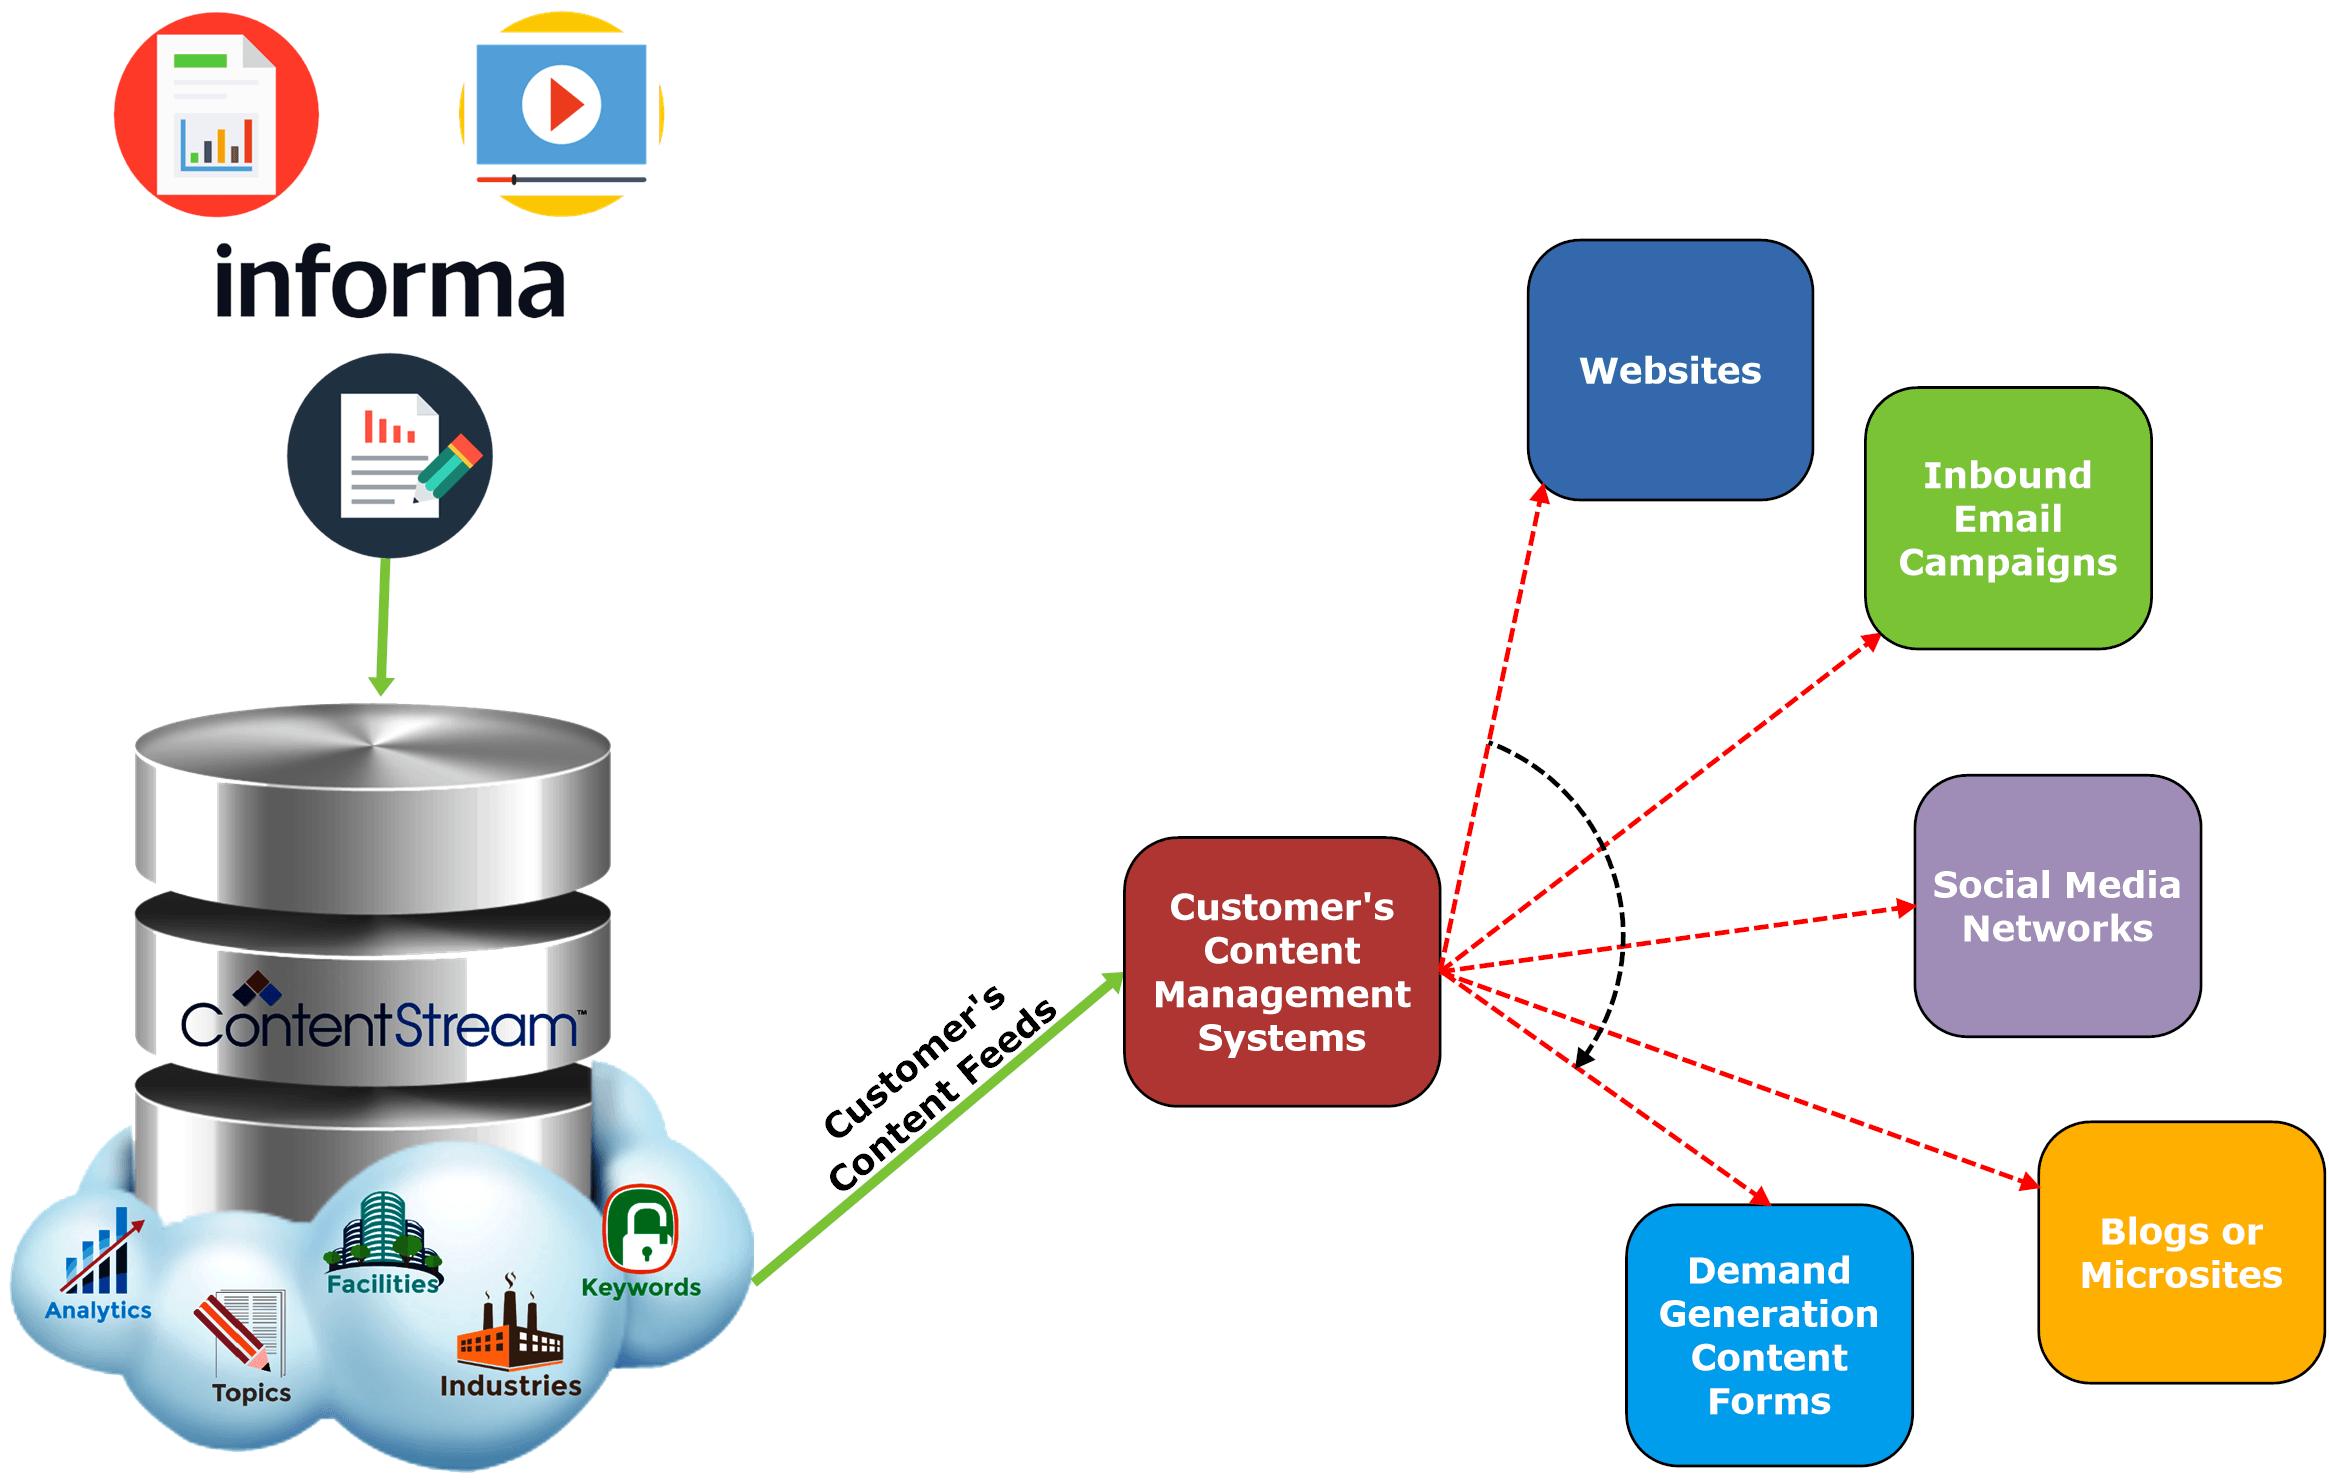 contentstream-informa-diagram-option-1-1-31-18